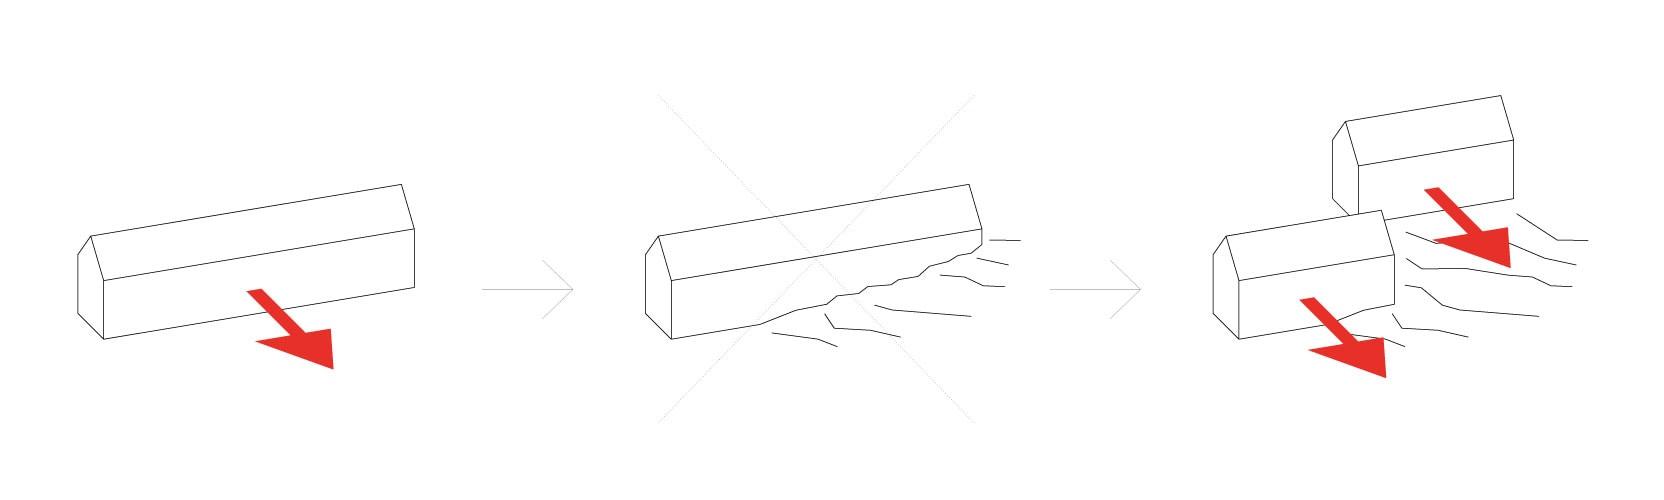 Concept Diagram - Genesis of the Form